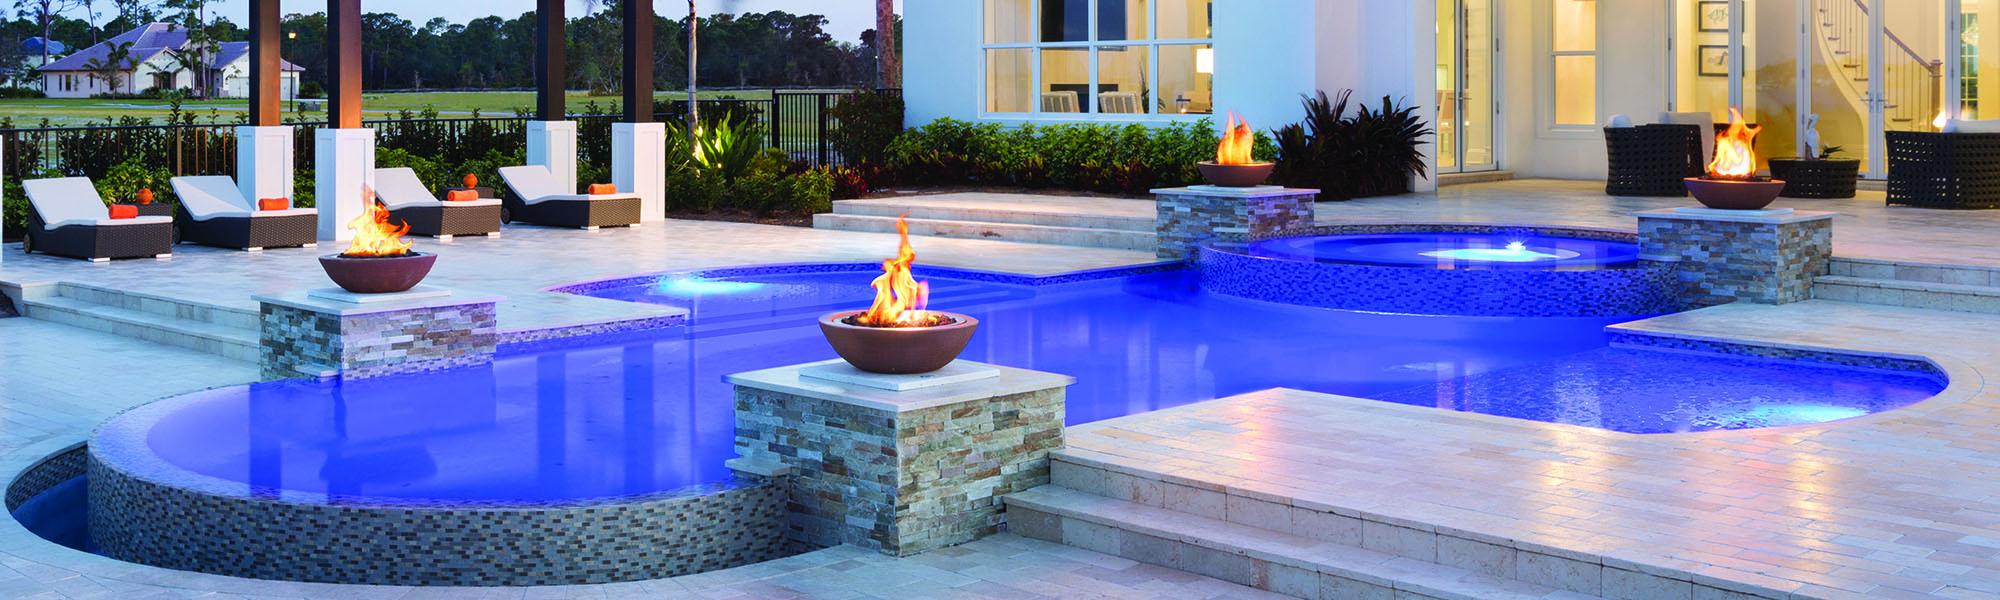 Florida Swimming Pool Association > Home